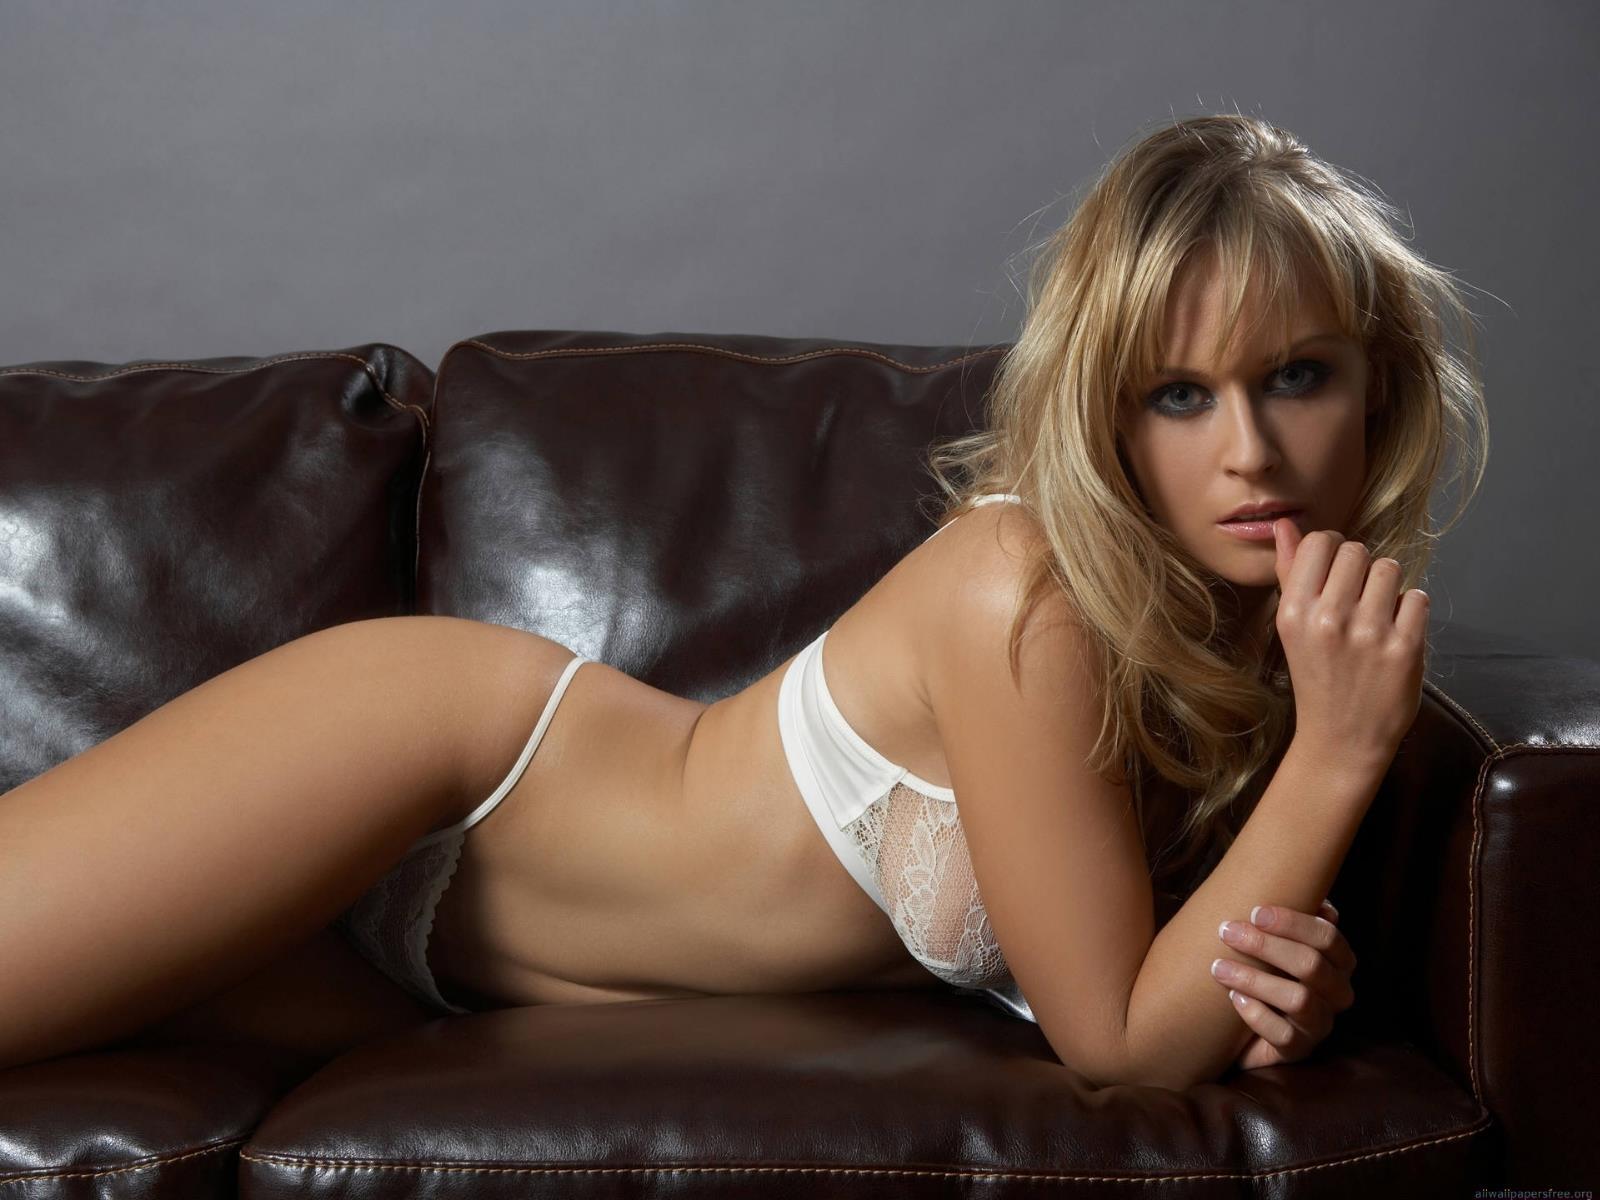 fonds-ecran-sexy_girls-hot-and-sexy_07